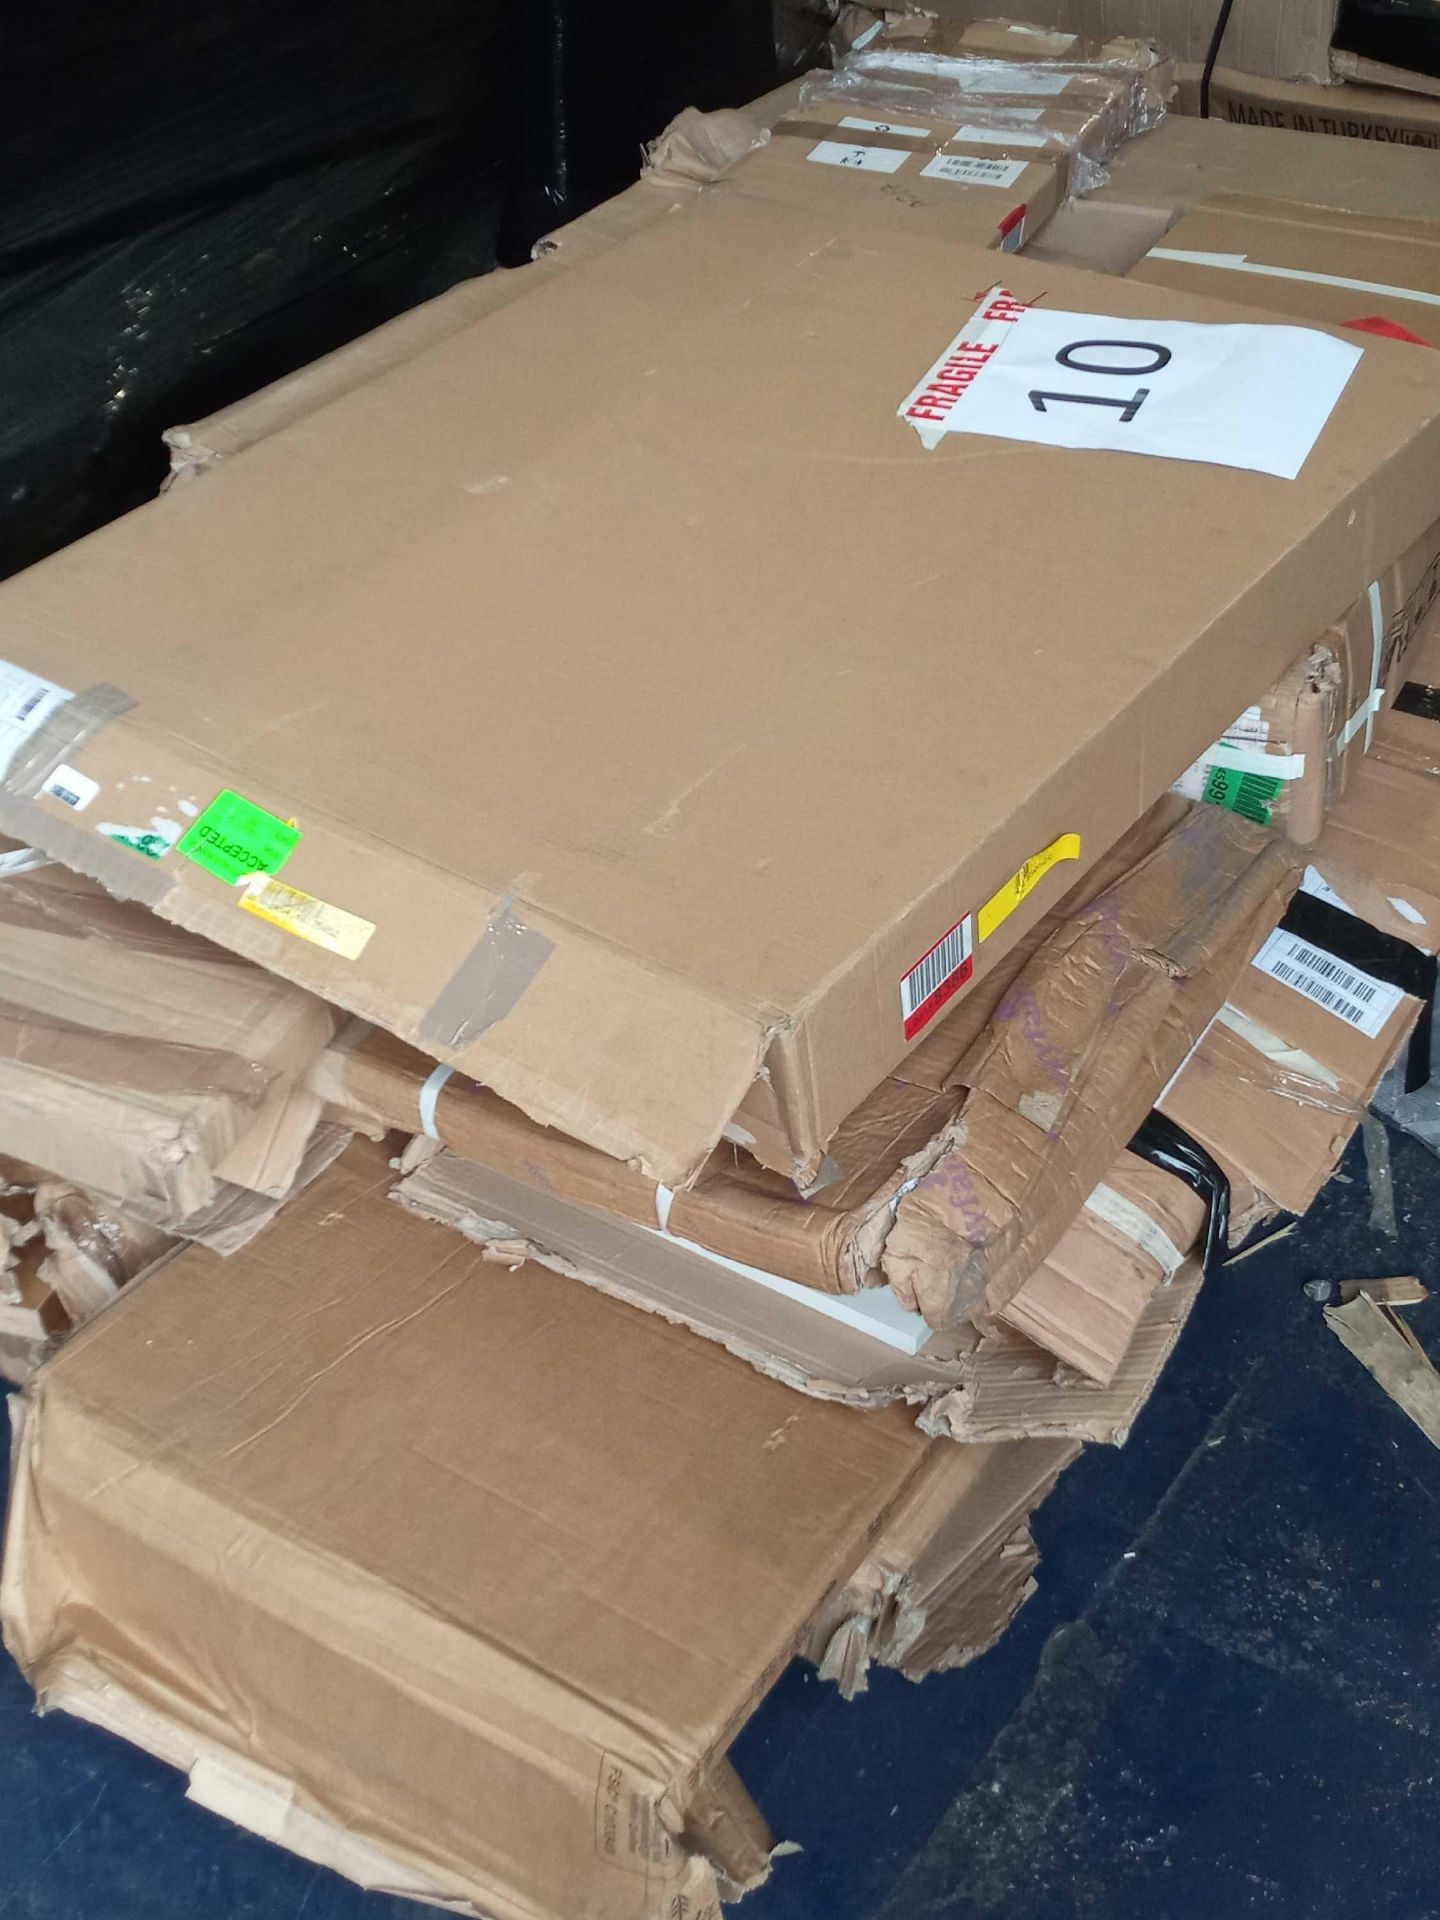 Rrp £300 Pallet Of Flatpack Furniture Part Lots